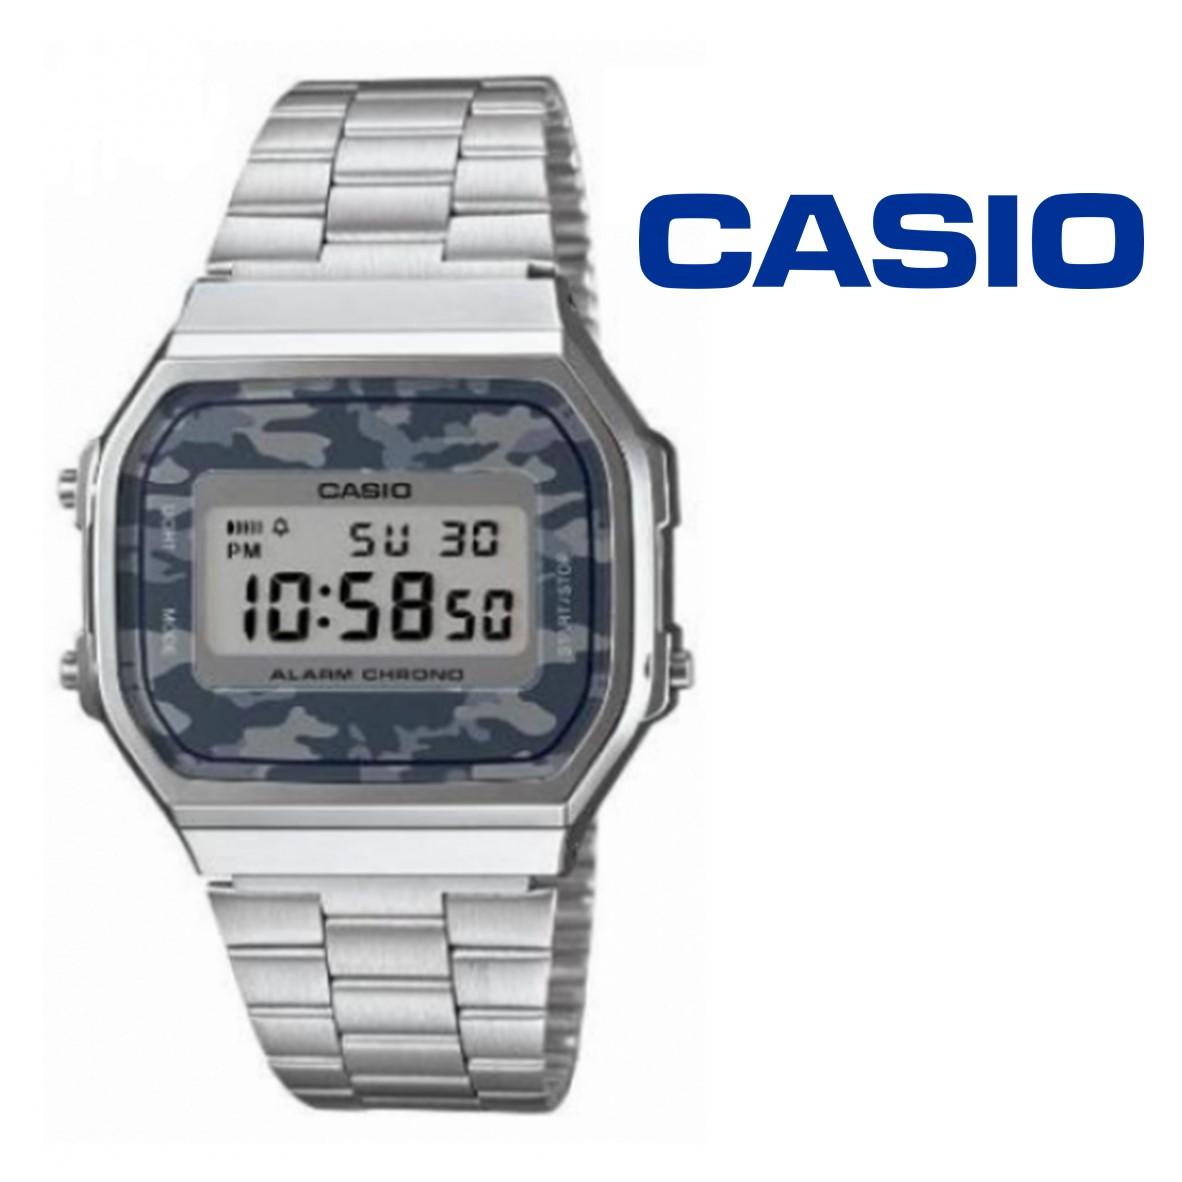 ffd30a6c42f Relógio Casio® Vintage Prateado Camuflado Cinza A168WEC-1 - You Like It